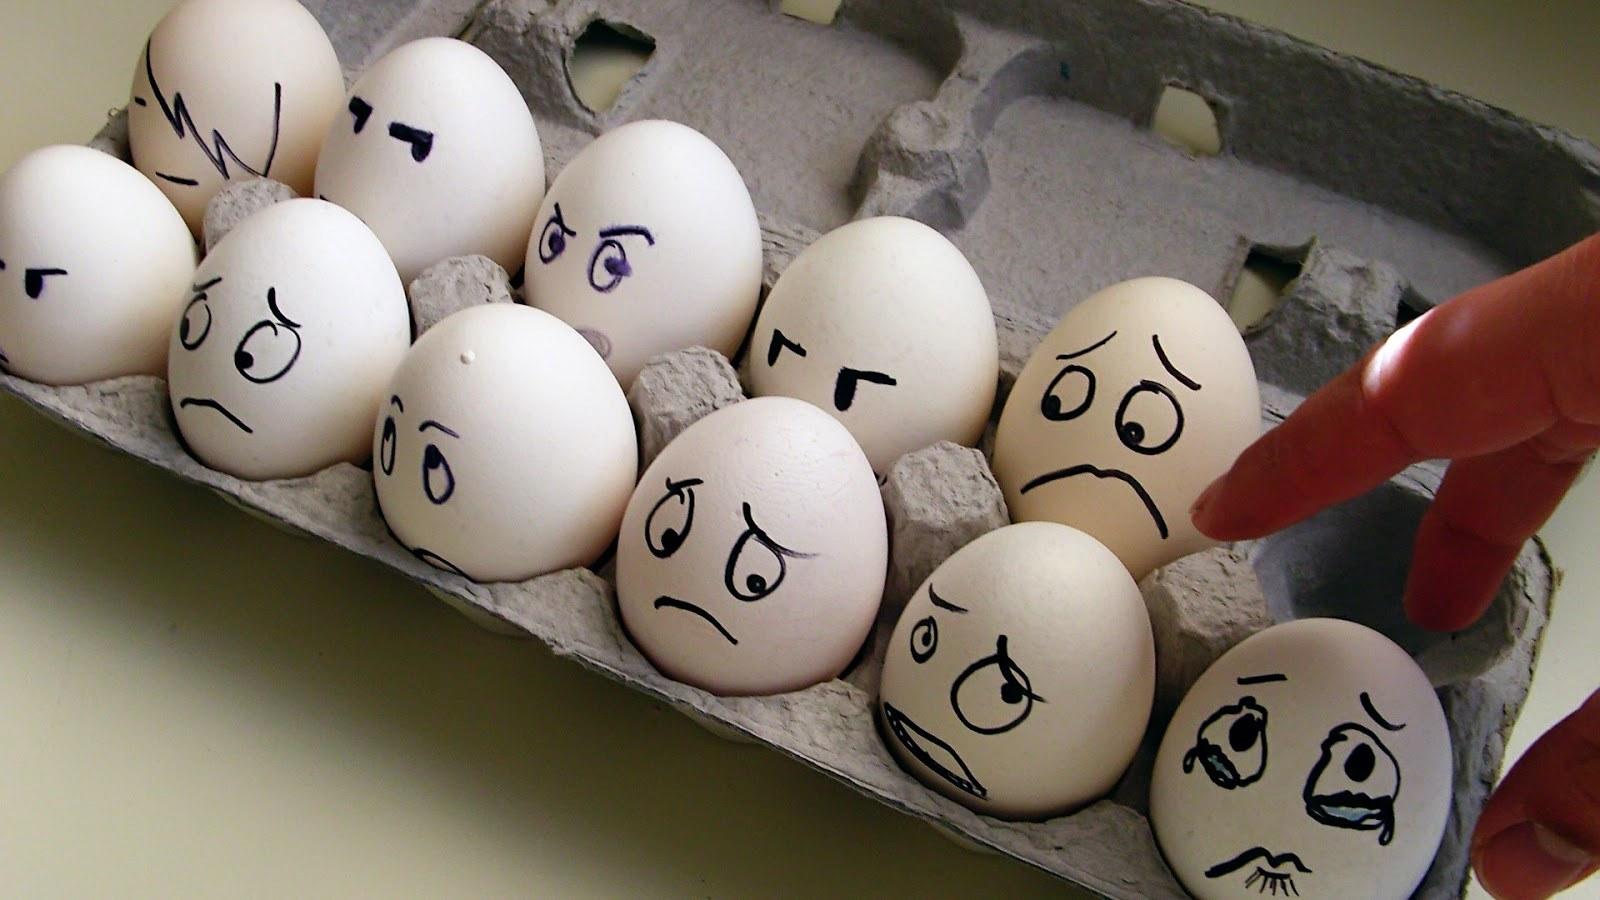 Не только яйца: пасхальная распродажа GearBest - 1